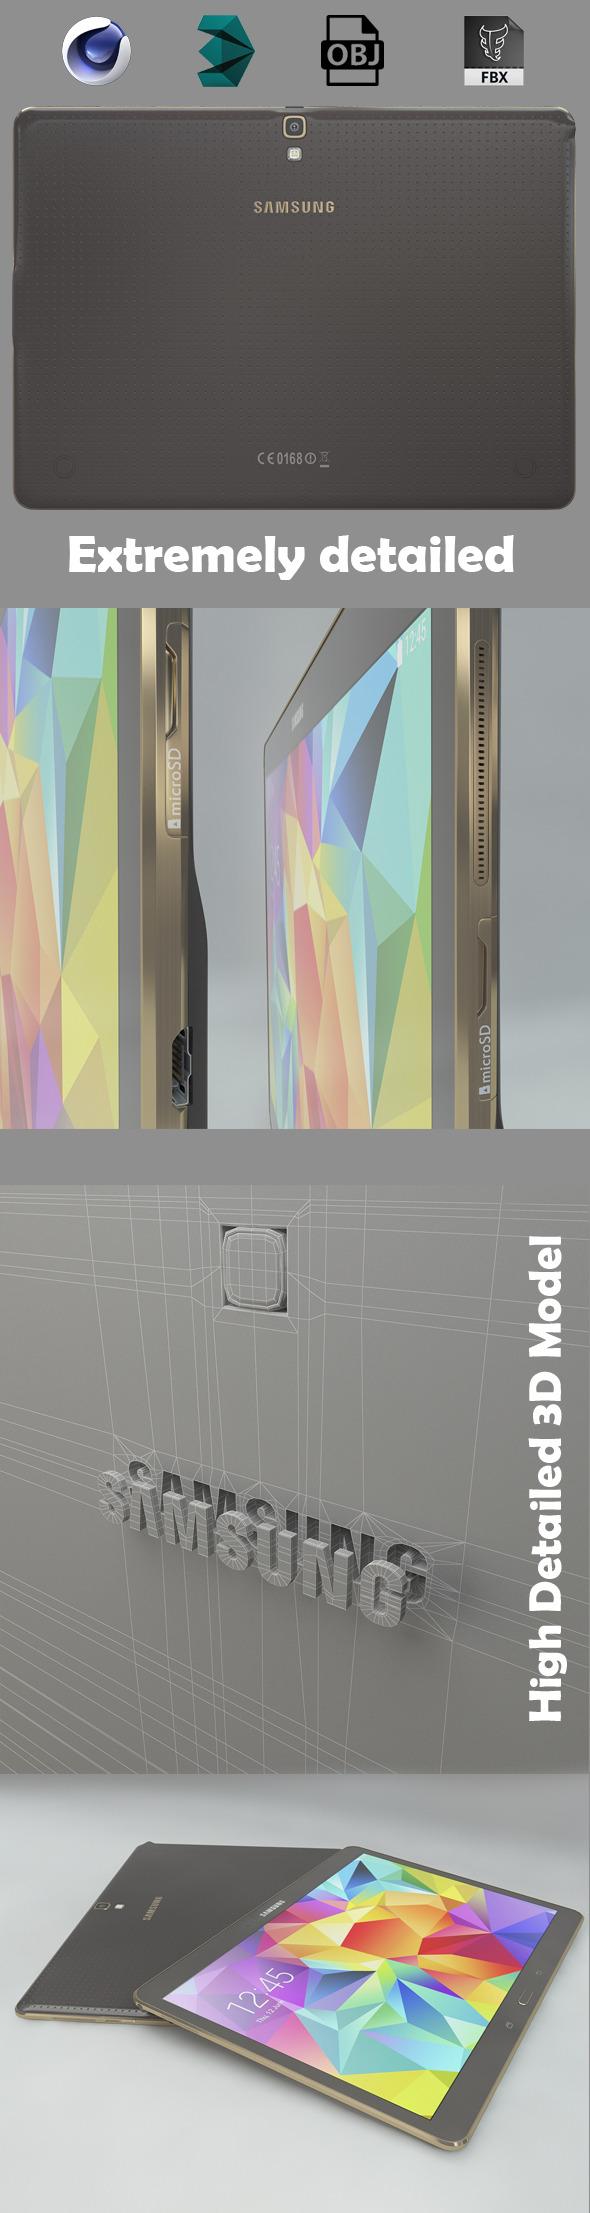 Samsung galaxy tab s 10.5 - 3DOcean Item for Sale